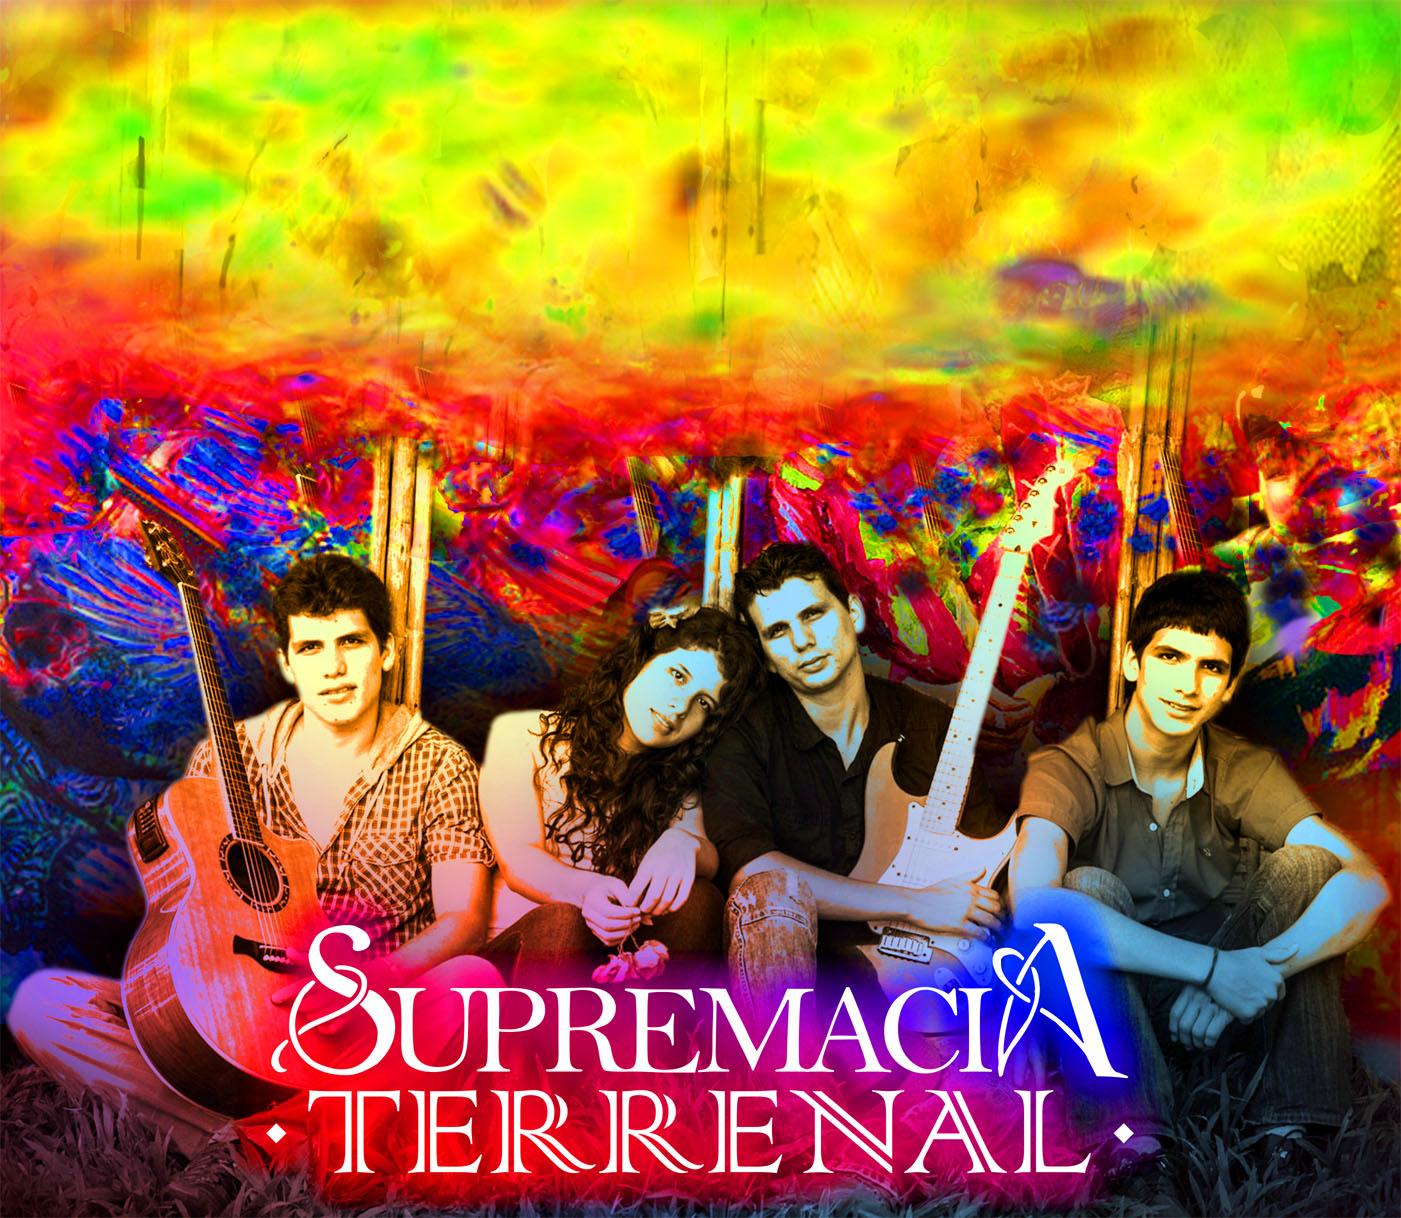 Supremacia Terrenal